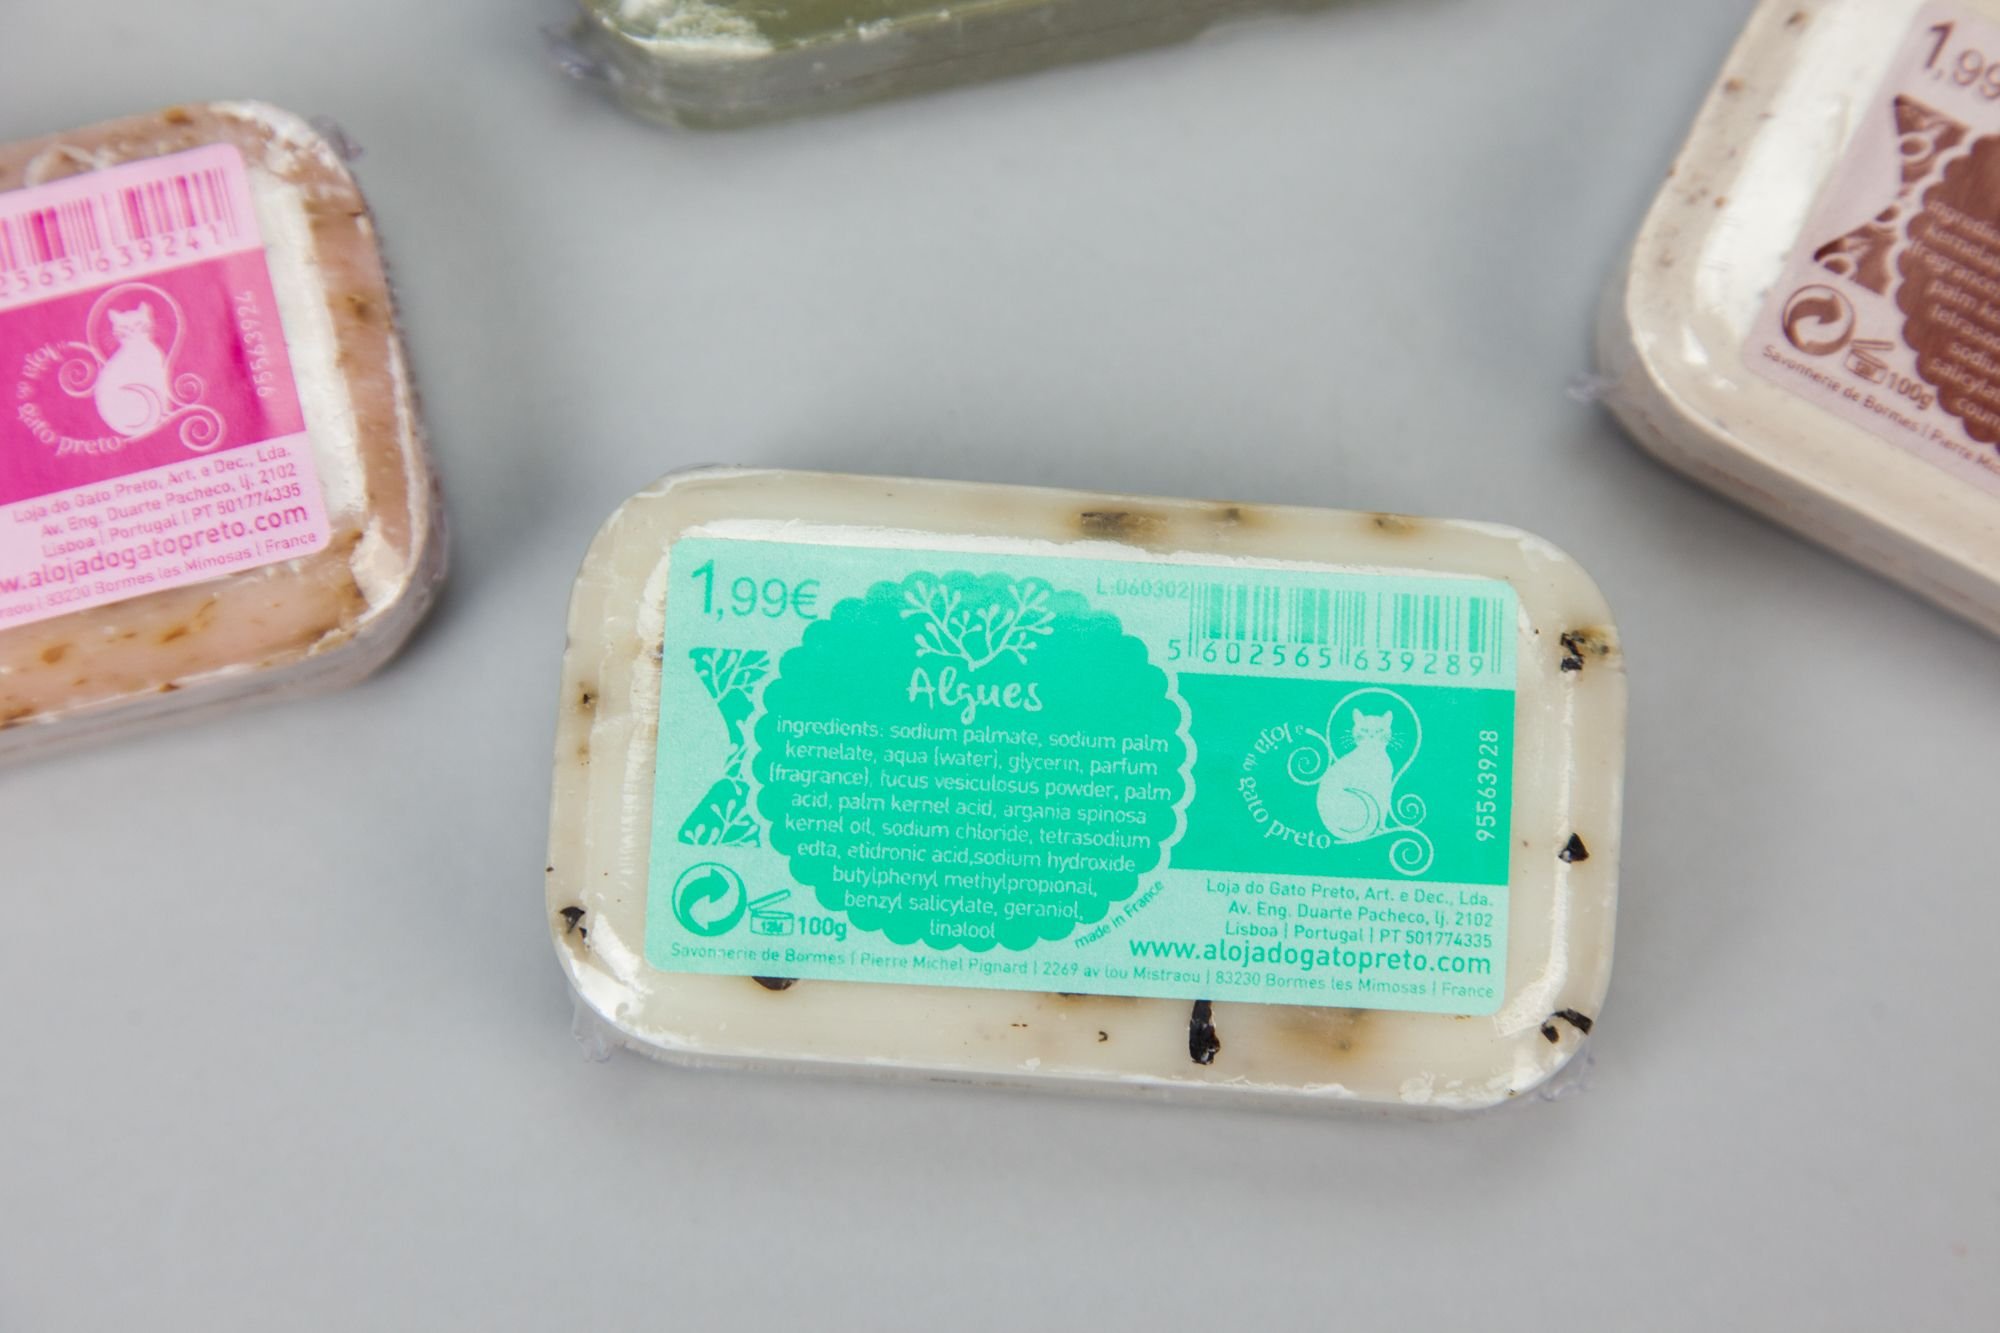 Sabonete «Algues» | A Loja do Gato Preto | #alojadogatopreto | #shoponline